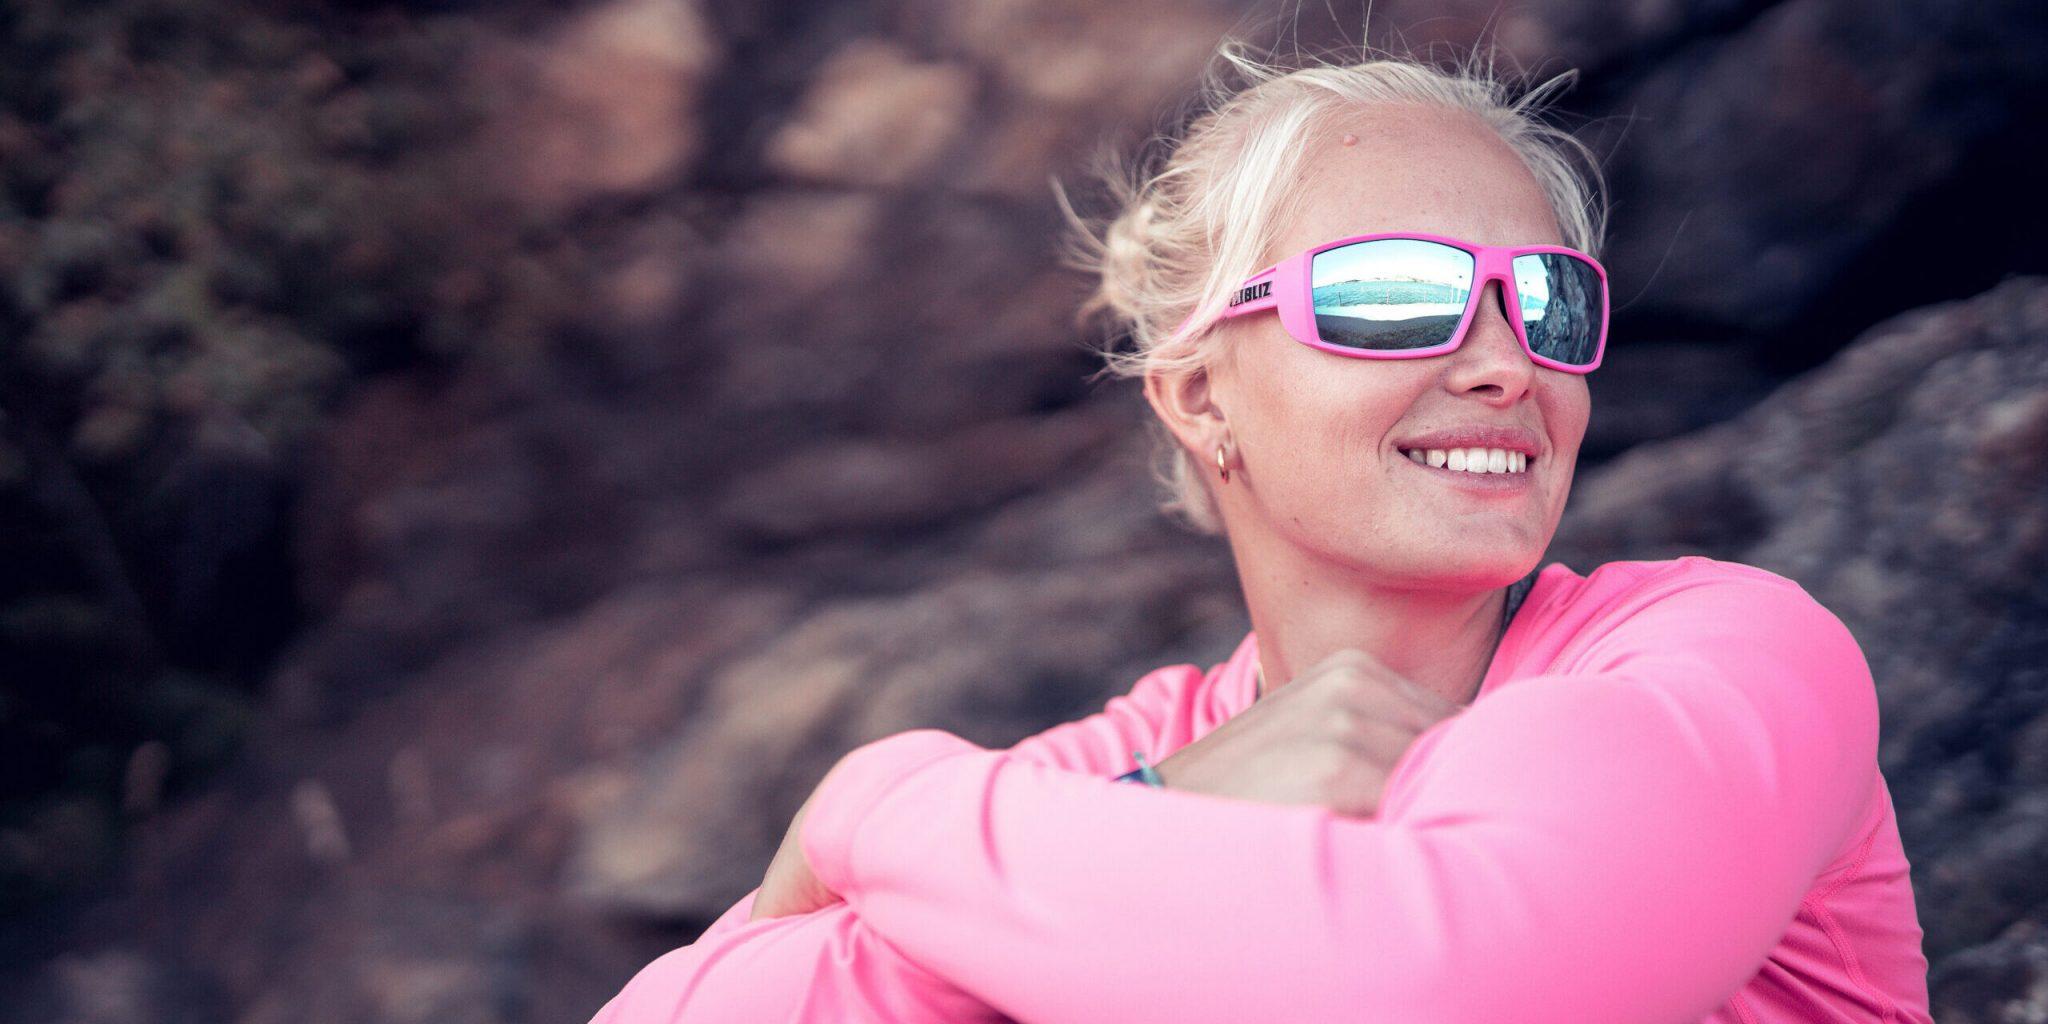 54001-43_drift-bliz sunglasses_lifestyle_pink_sportsglasses_lovisa karlsson_lifestyle2